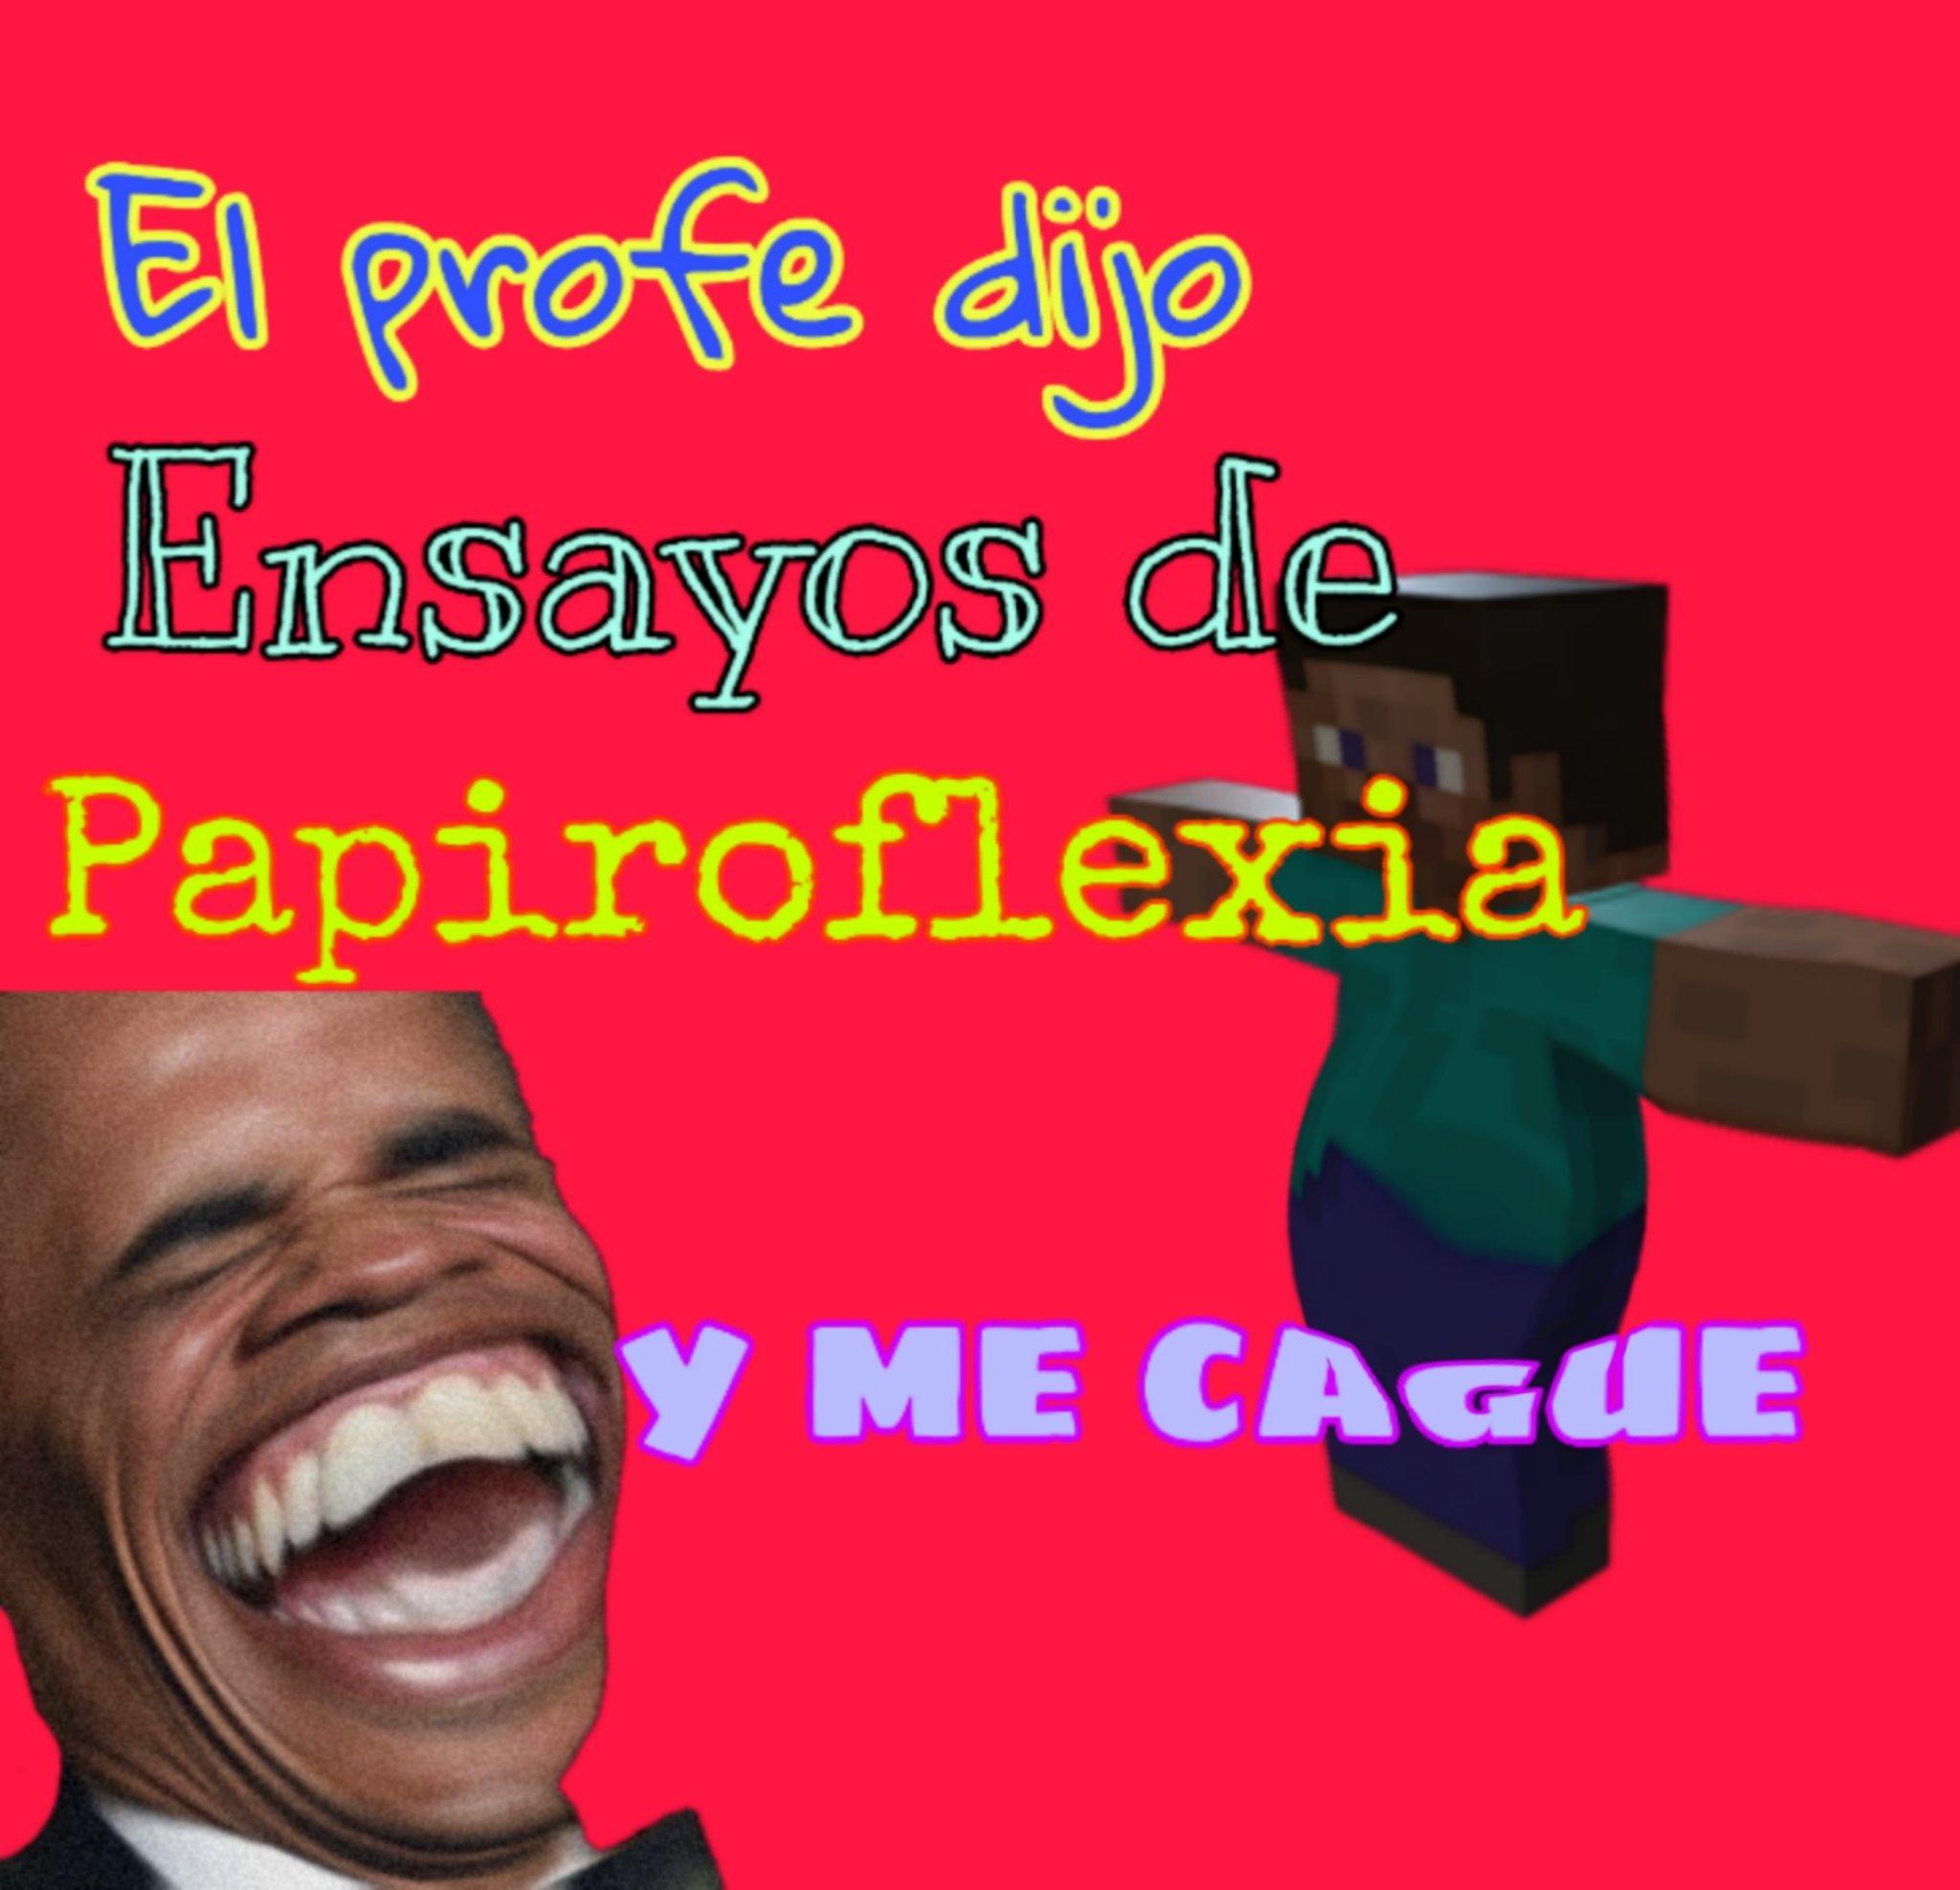 Ensayos de Papiroflexia jajajajaja - meme